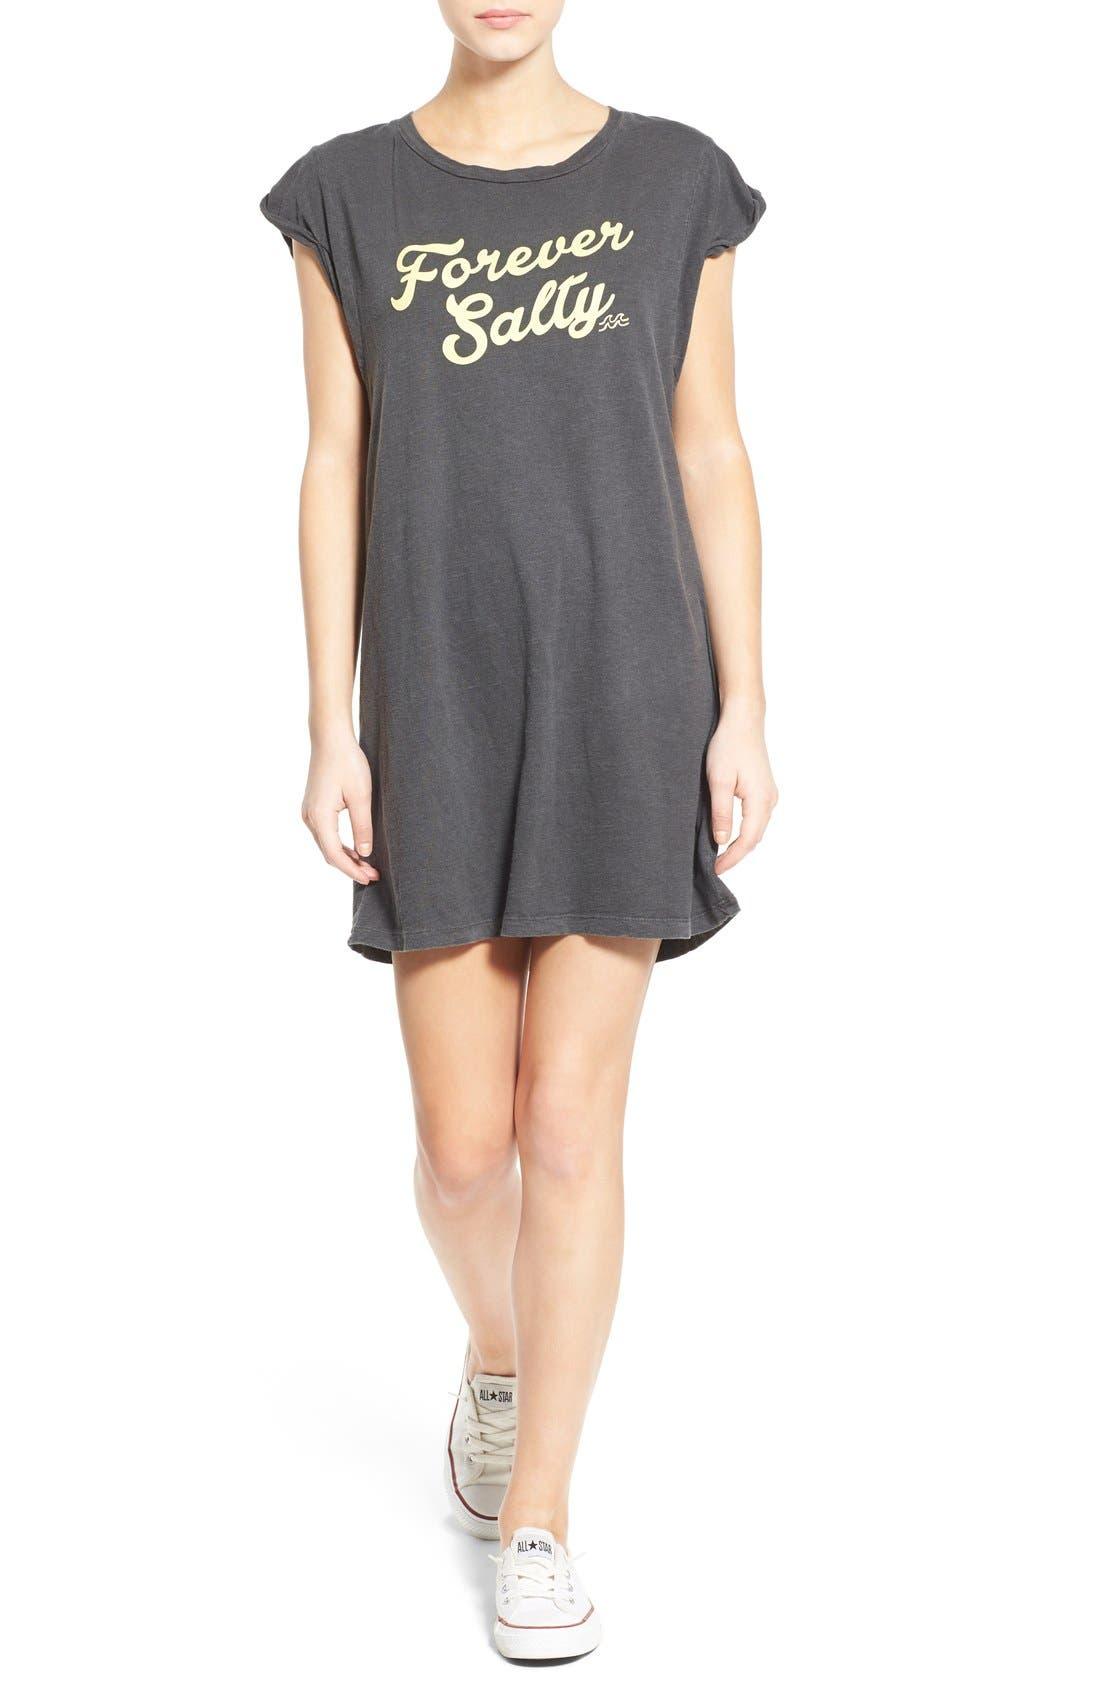 Main Image - Billabong 'Forever Salty' Graphic T-Shirt Dress